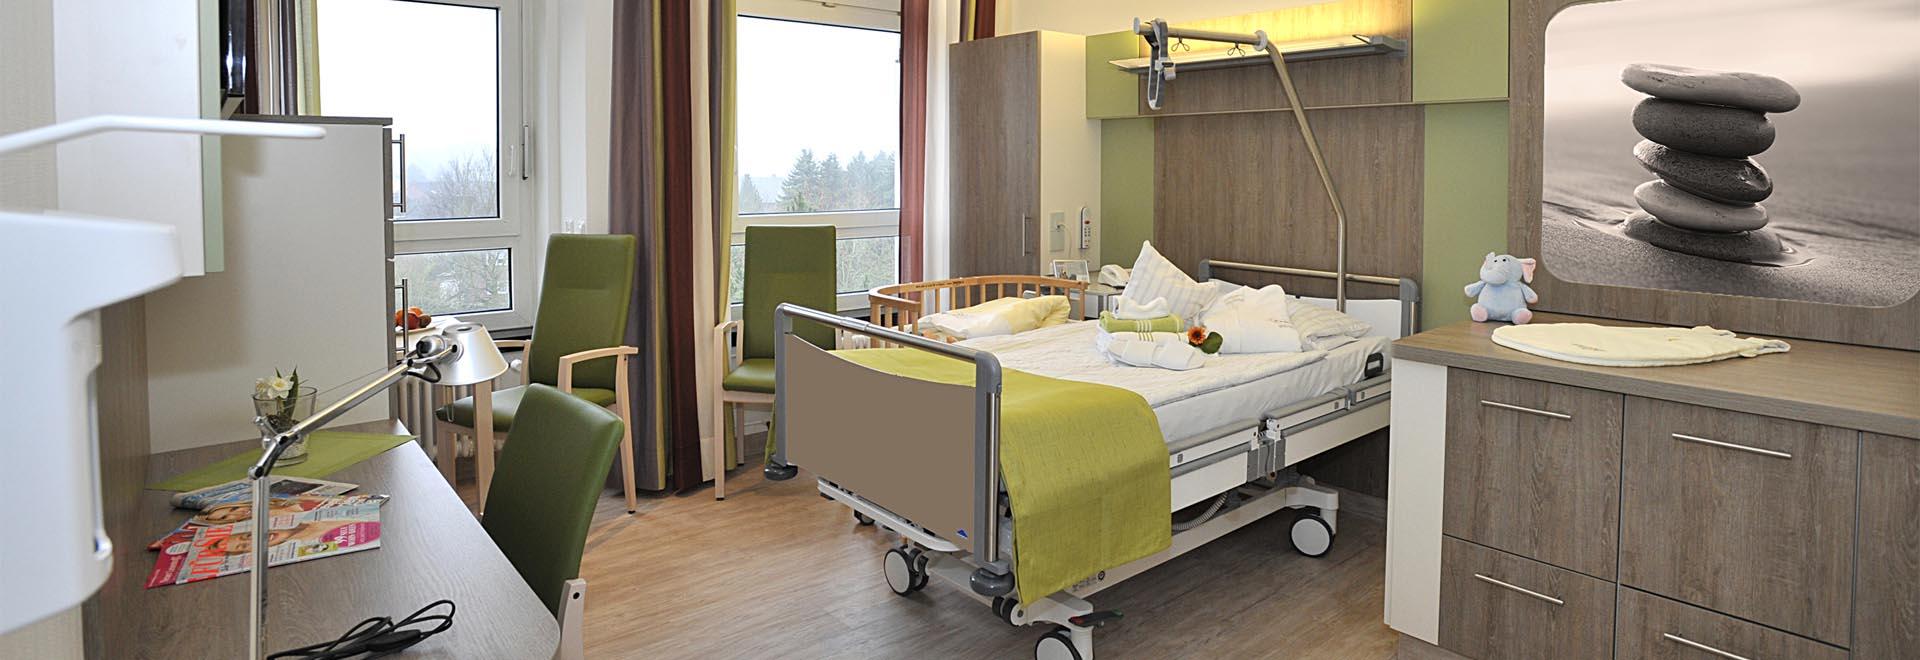 krankenhaus zuzahlung pro tag